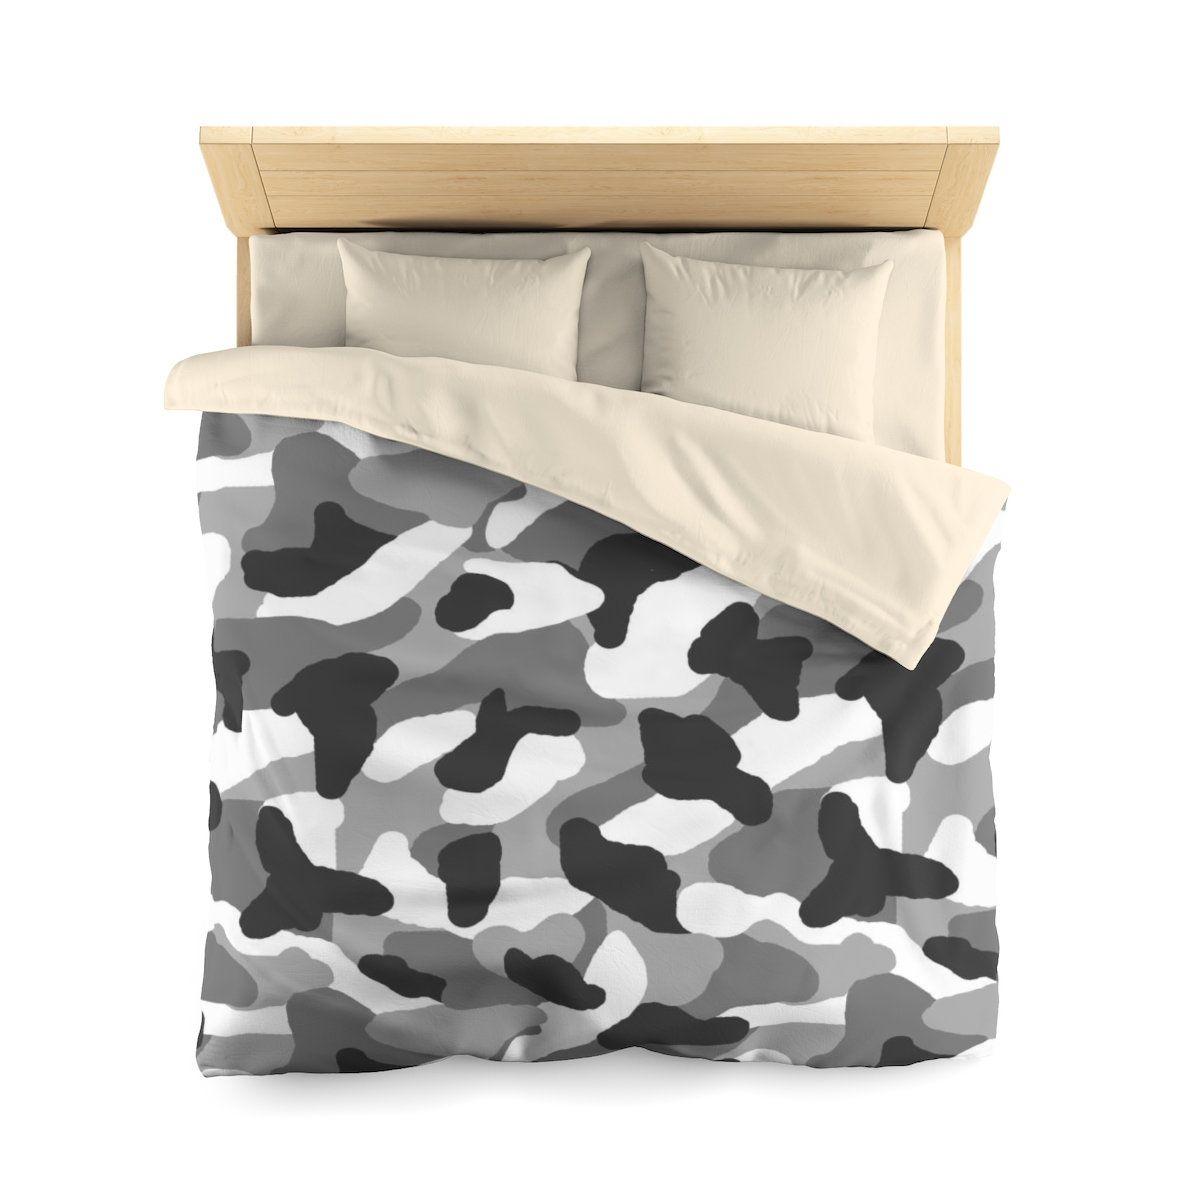 Camo Duvet Cover Gray Grey Camouflage Bedding Boys Room Decor Rustic Home Farmhouse Hunting Cabin Bedroom Comforter Blanket In 2020 Gray Duvet Cover Comfortable Bedroom Duvet Covers